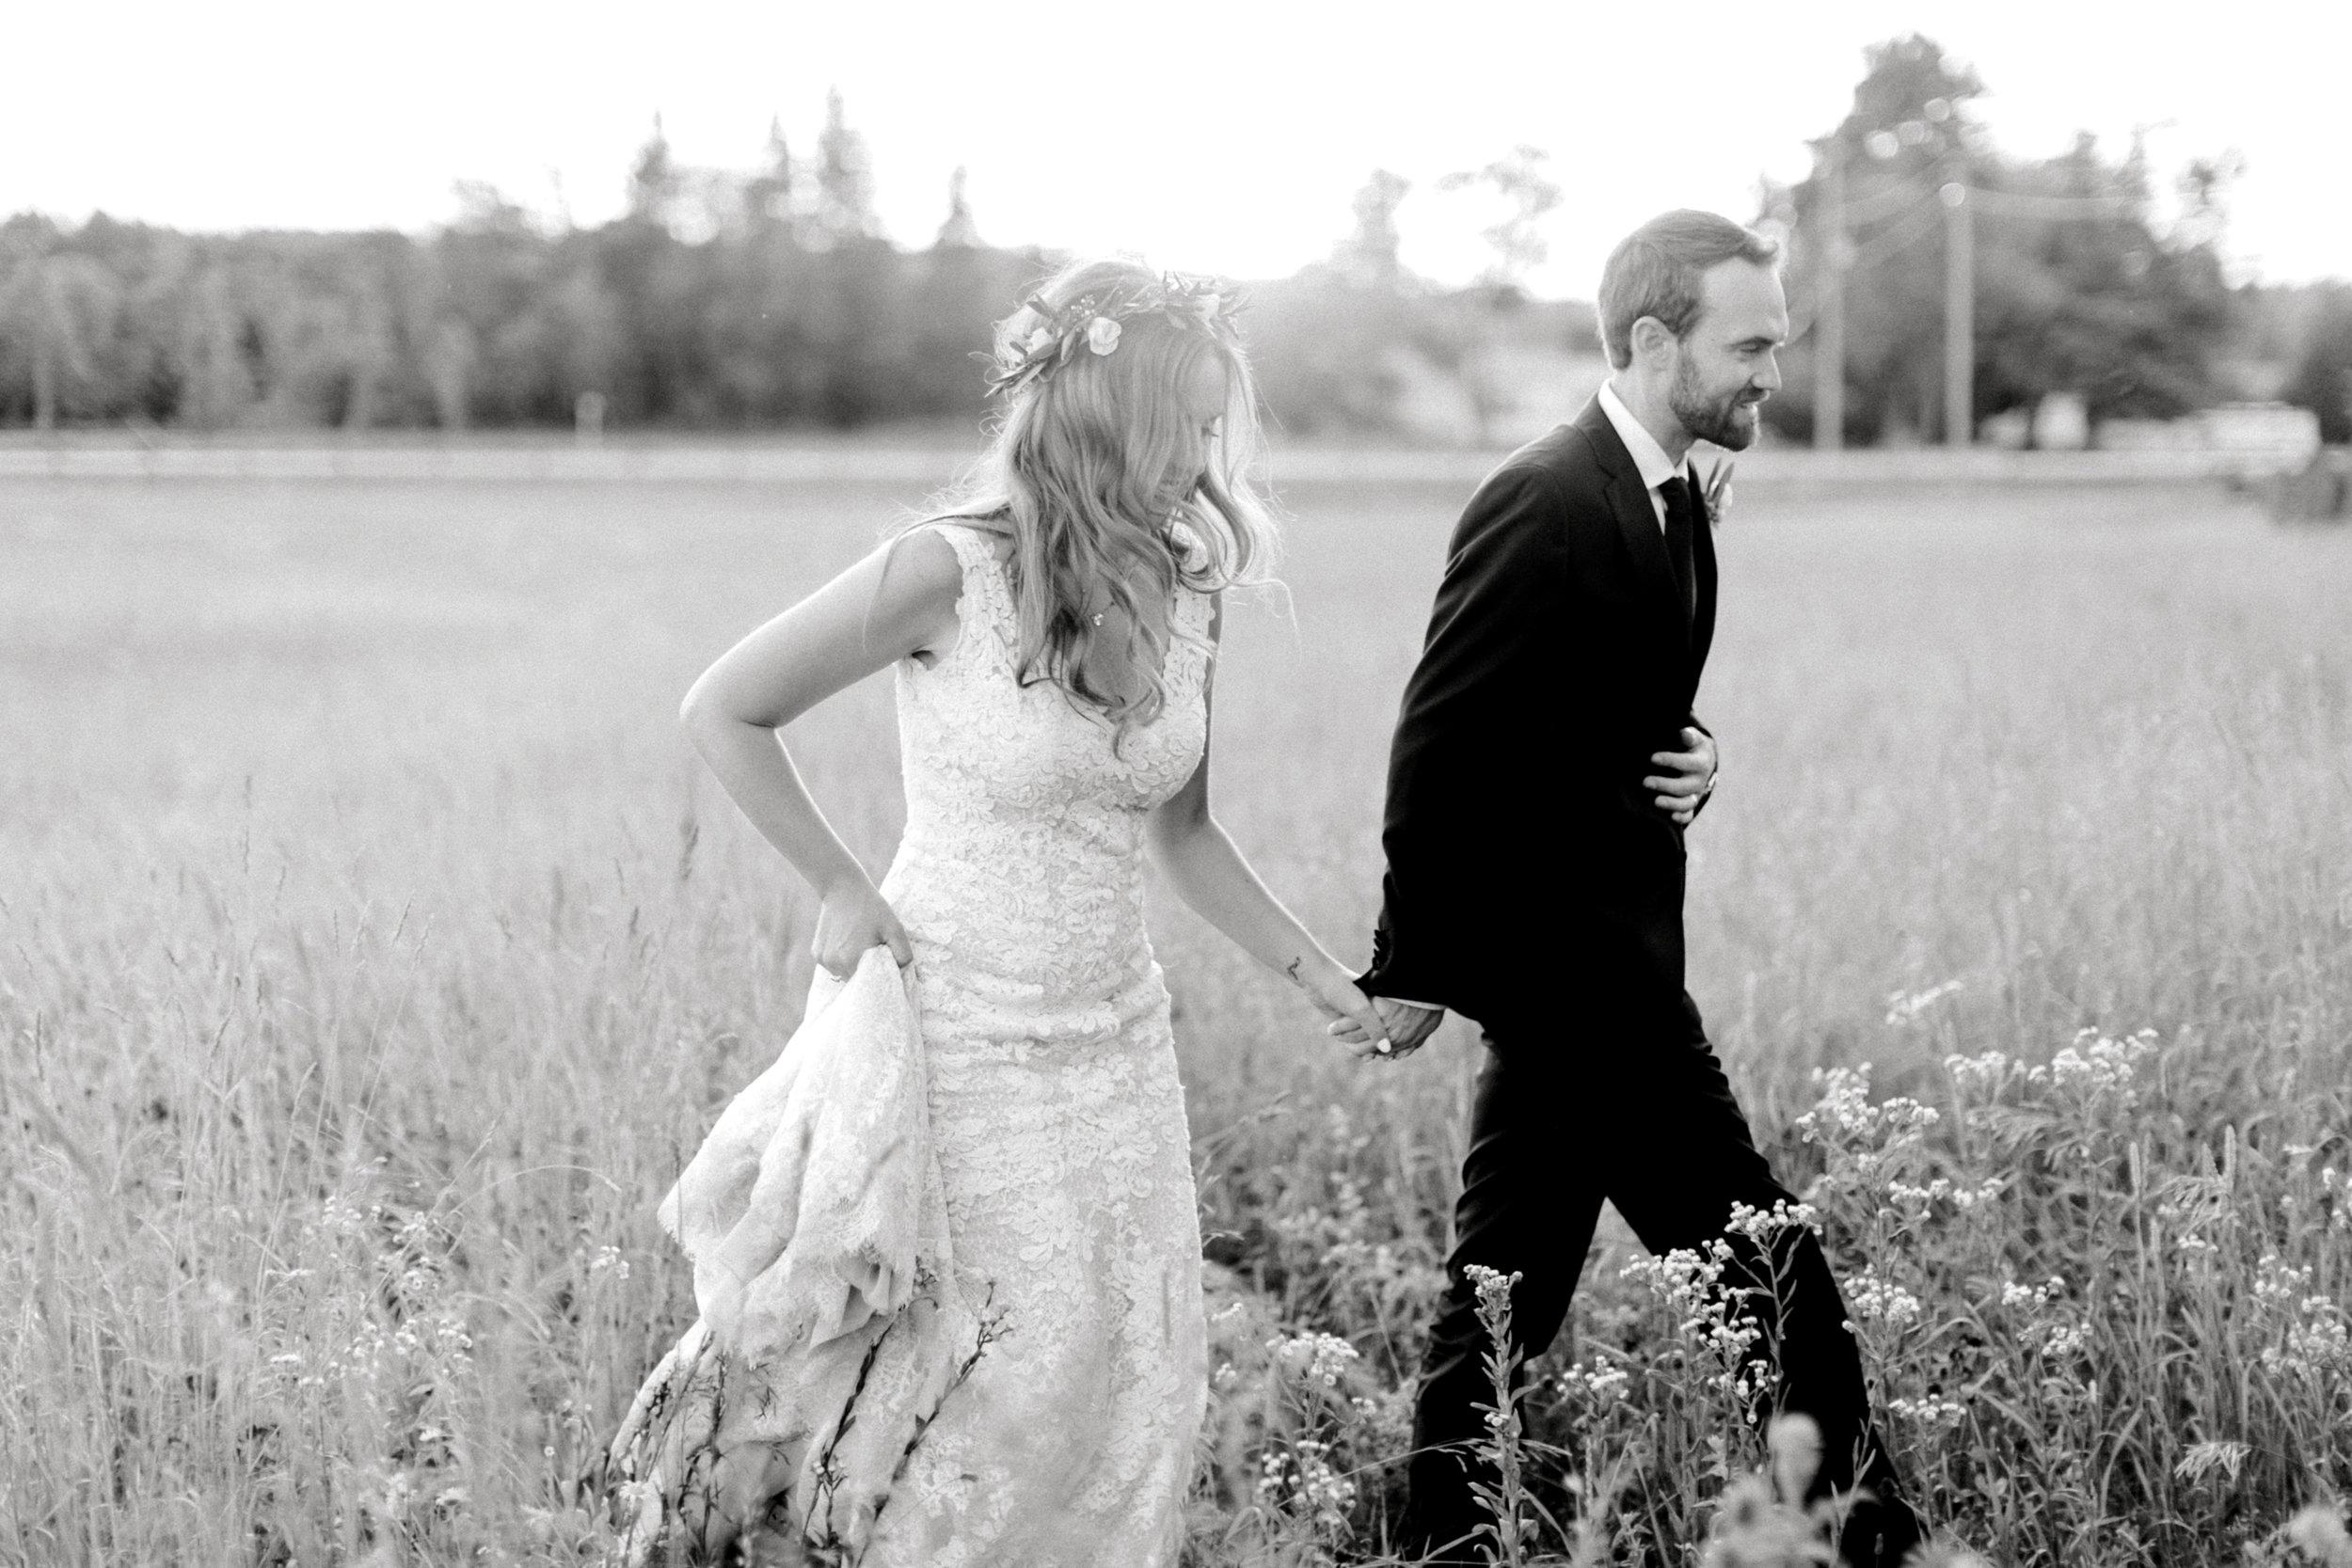 cambium-farms-kurtz-wedding-toronto-photographer-langdon-film-richelle-hunter-cori-joey-671.jpg